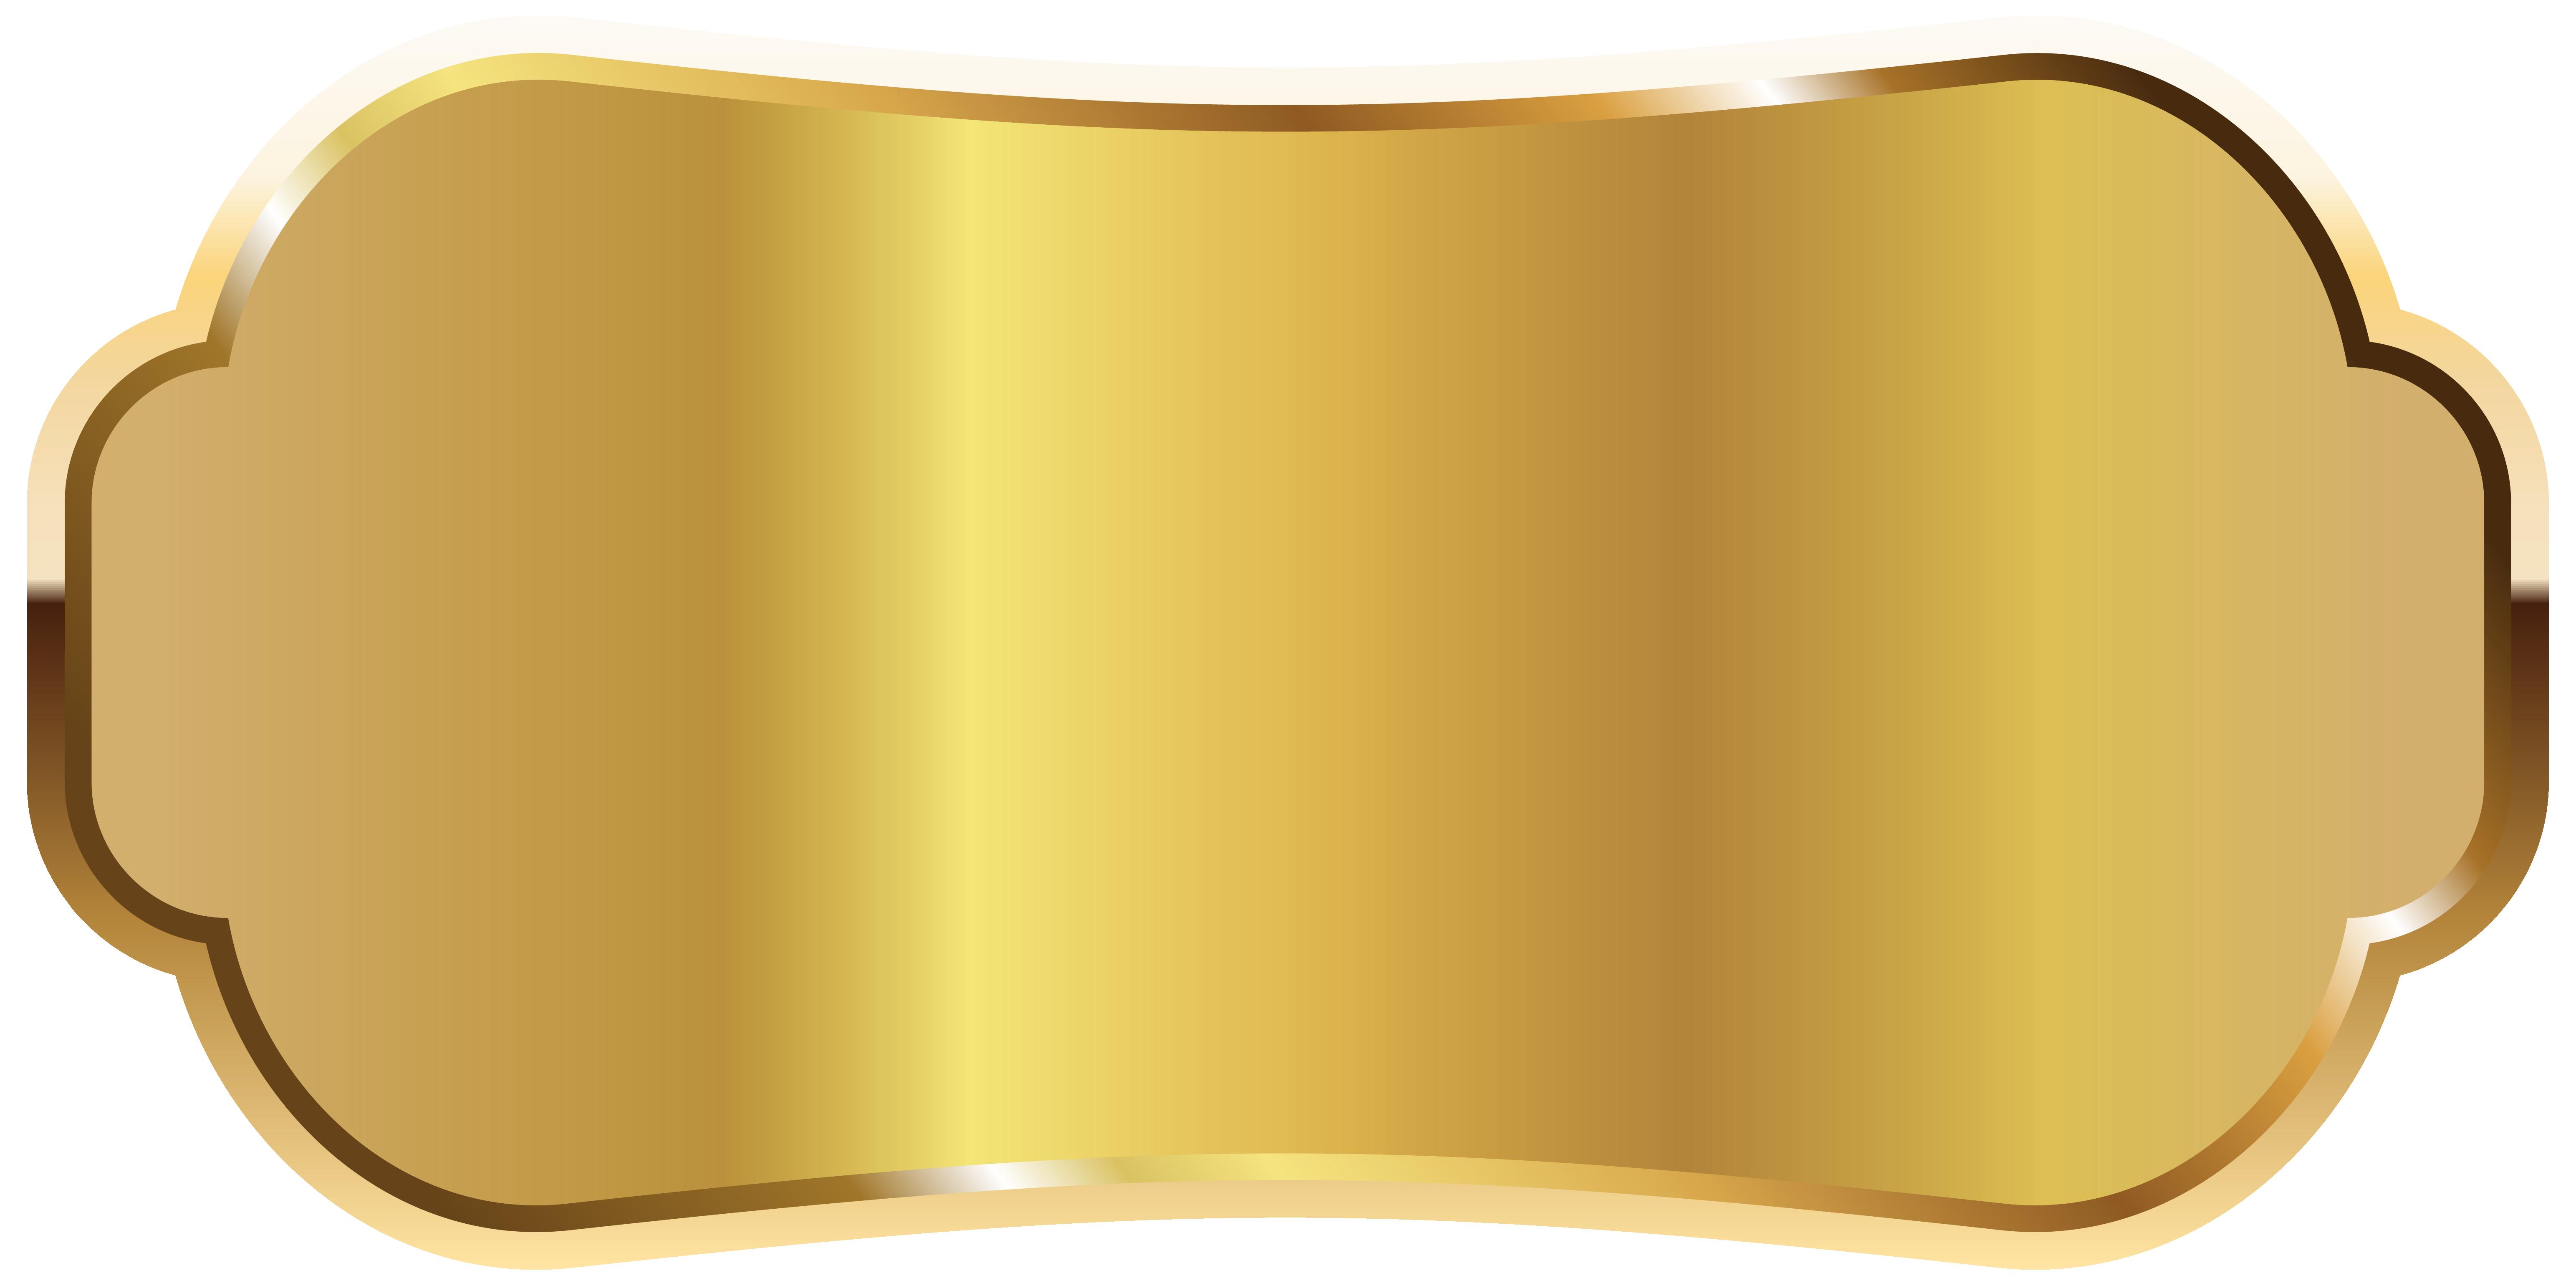 Label clipart royalty free. Golden png image urj